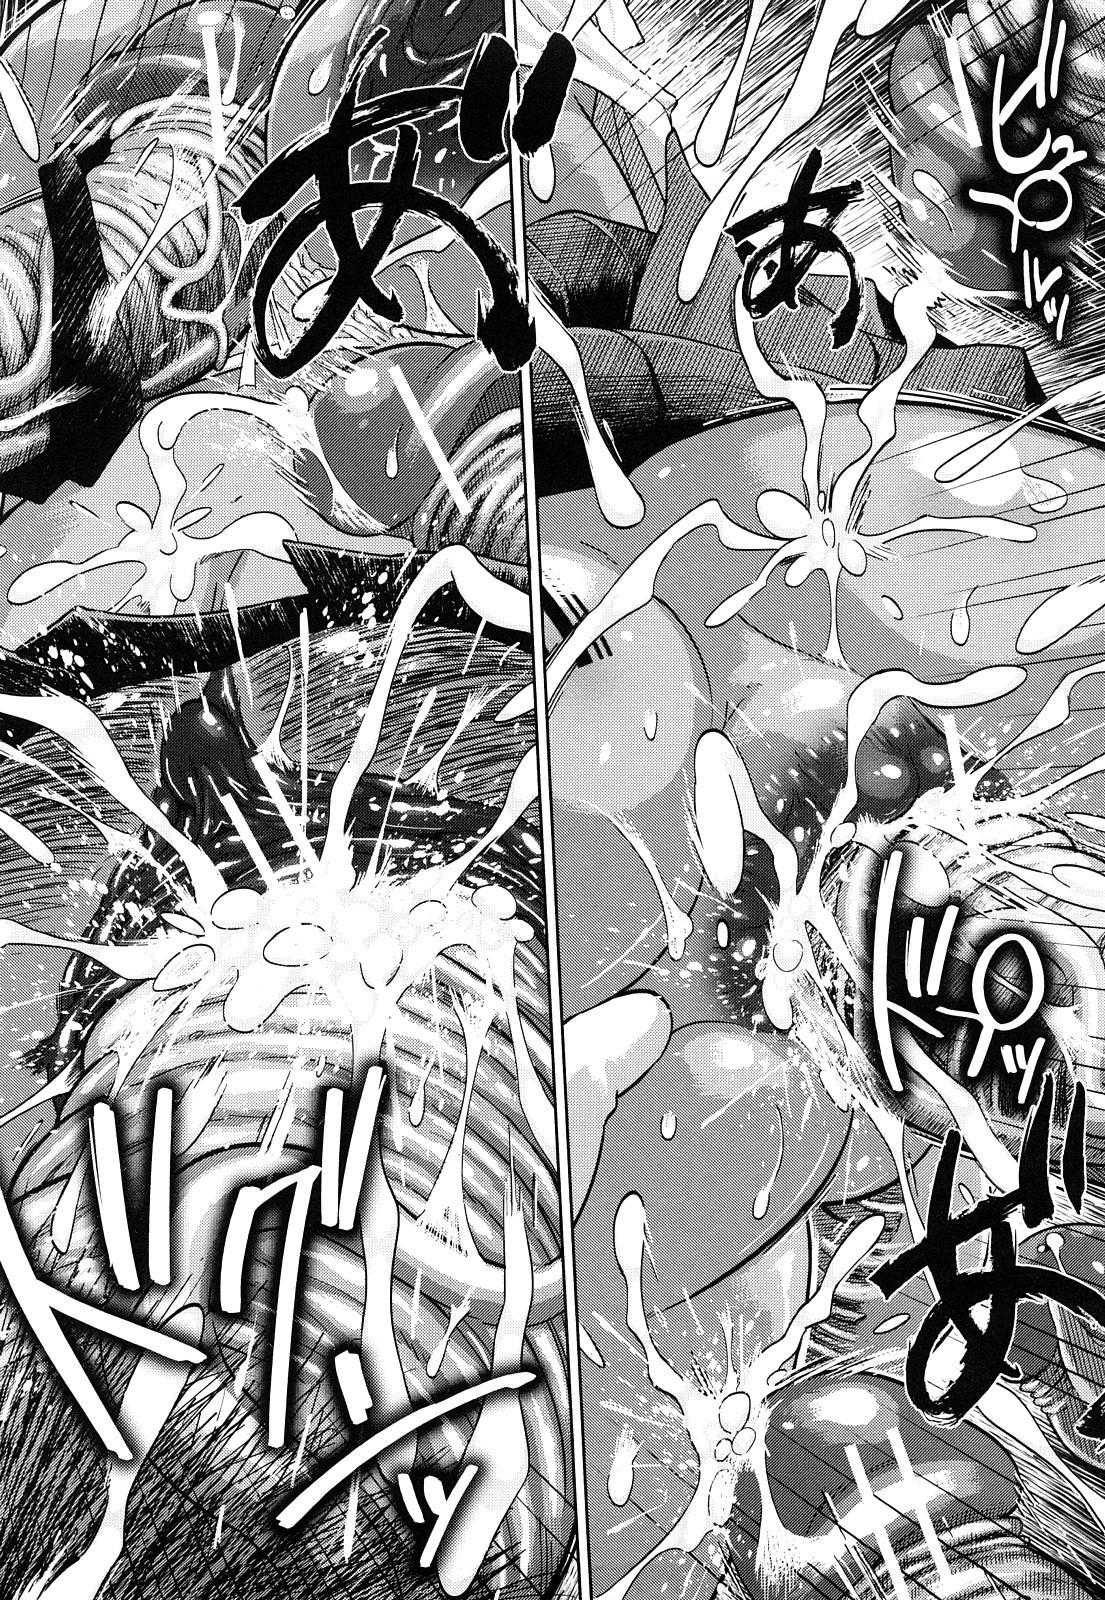 Seifuku Mesubuta Chitai - The Nymphomaniac Zone 230